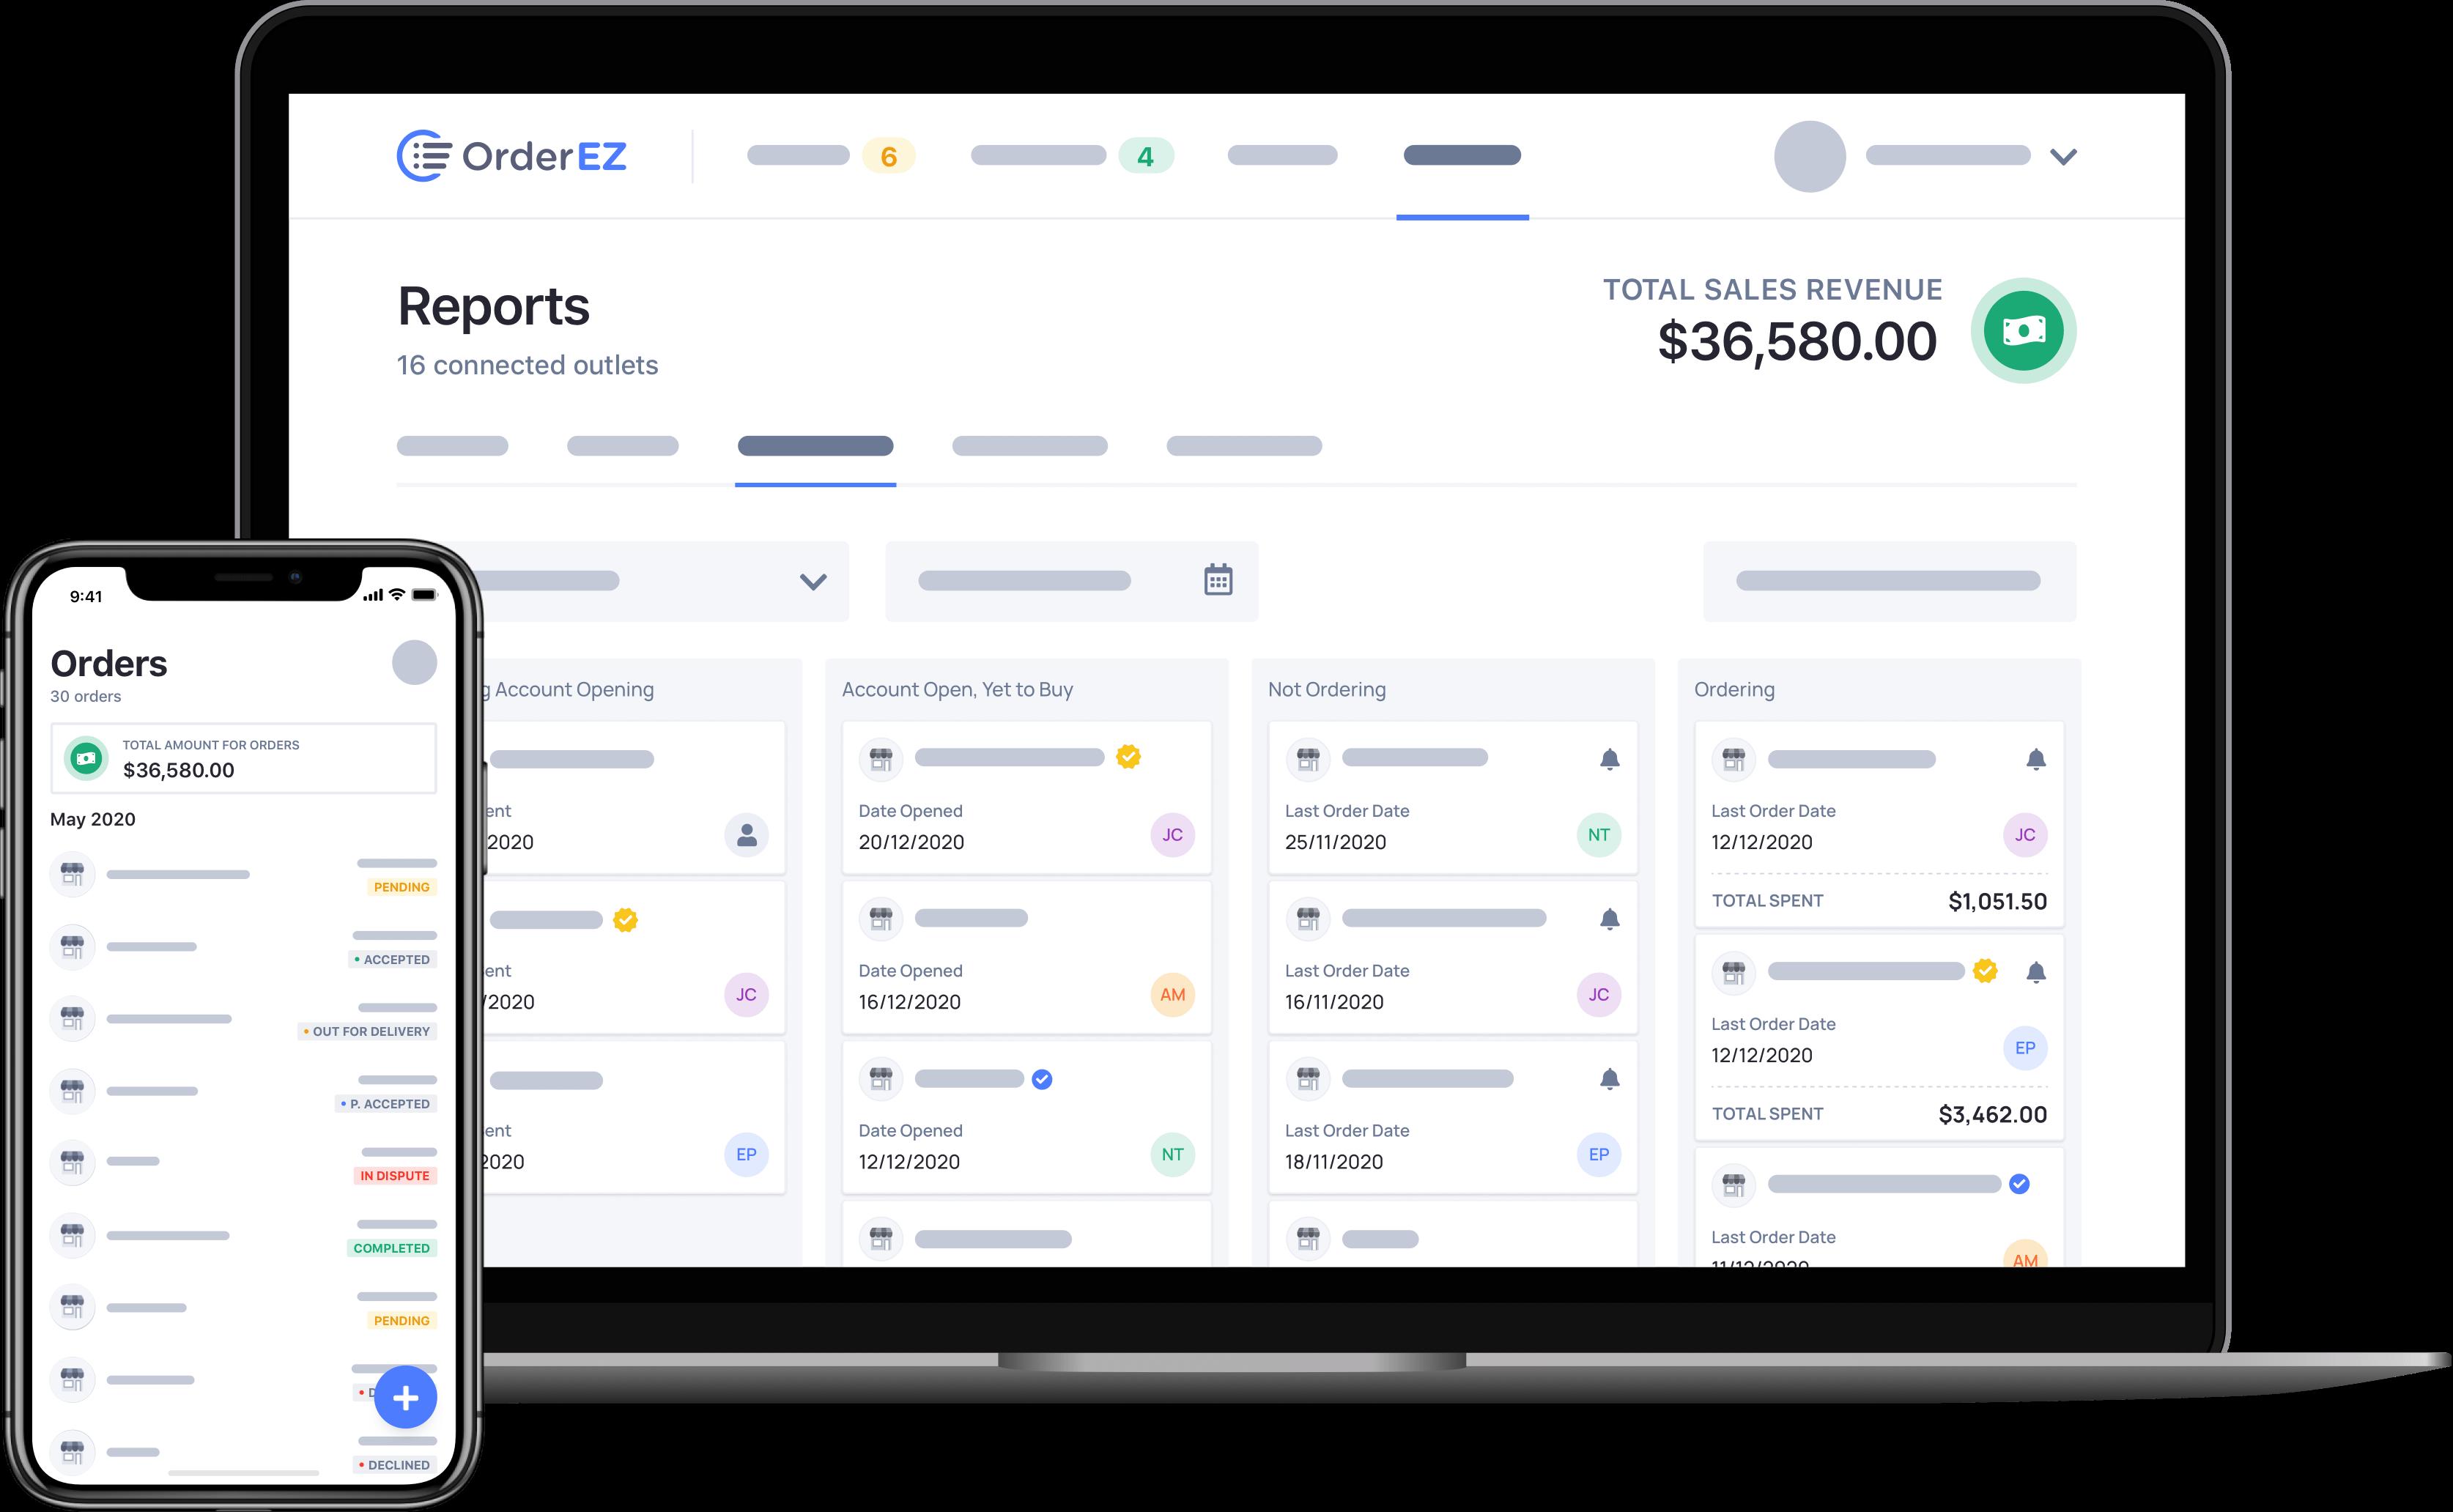 OrderEZ platform overview